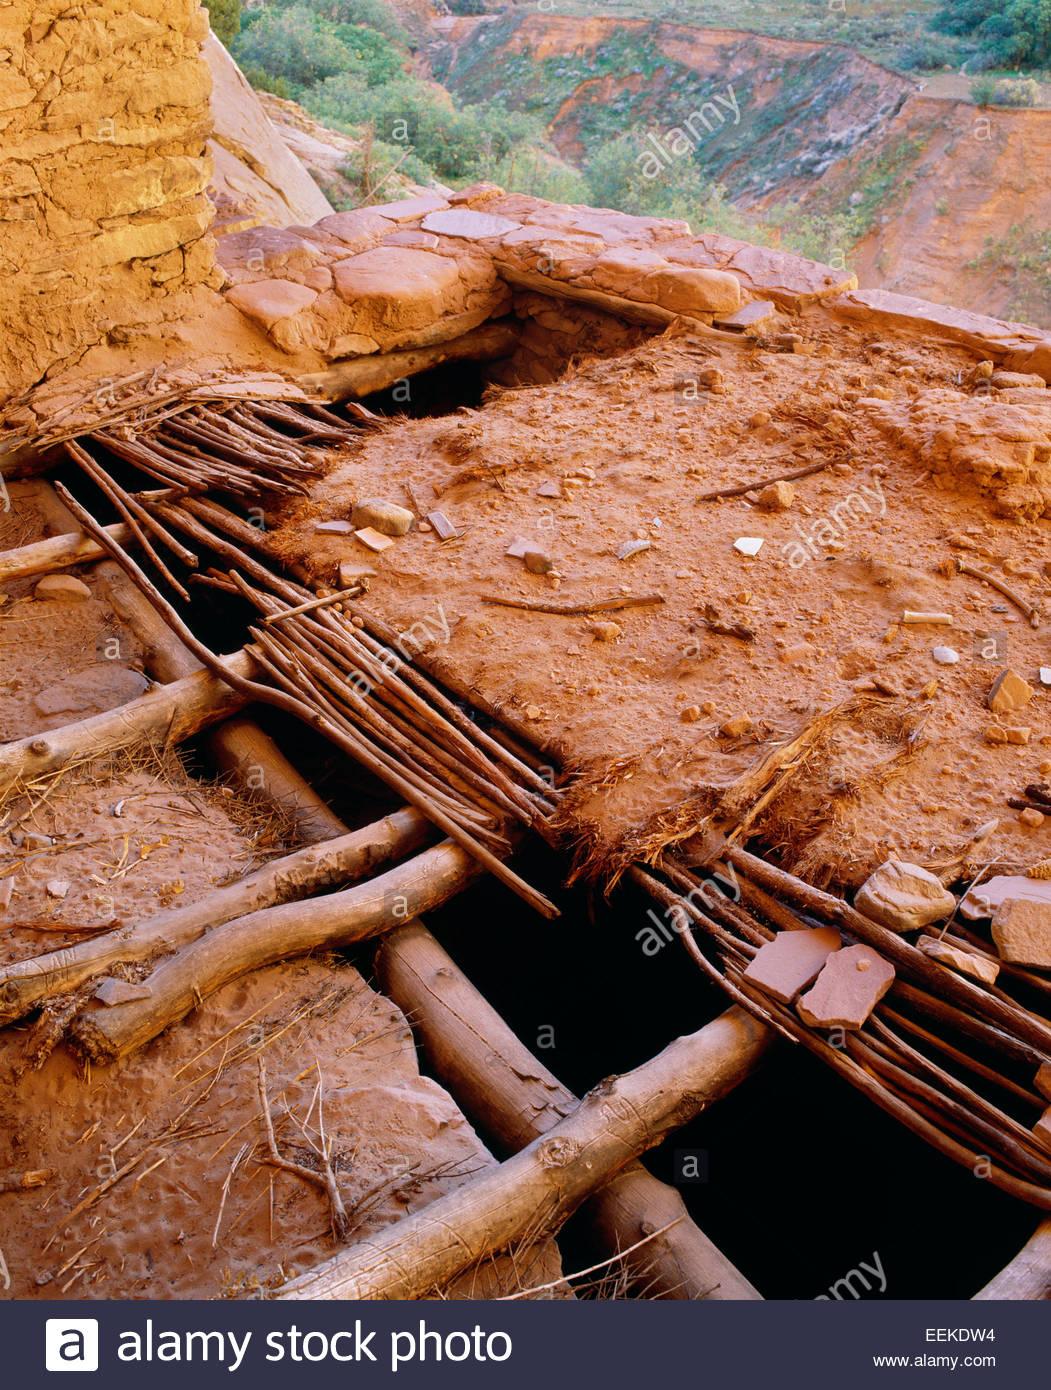 Original roof detail of mud and willows,  Ancient Anasazi dwelling.  Navajo National Monument, Arizona. Stock Photo